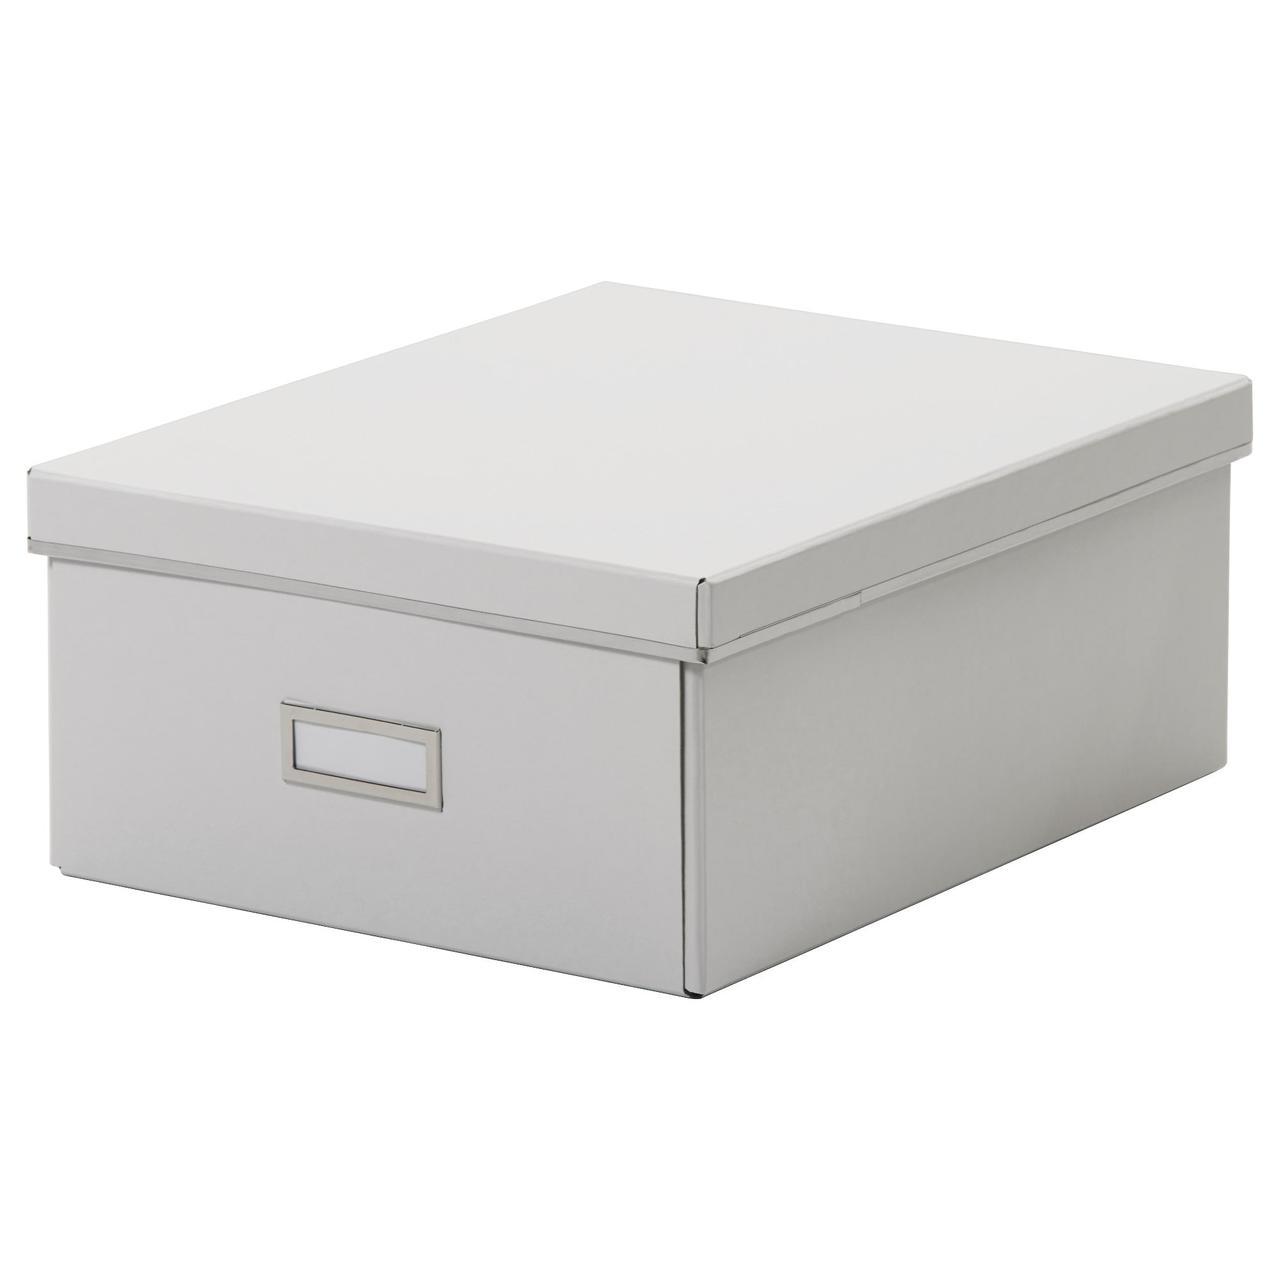 IKEA SMARASSEL (203.000.07) Коробка з кришкою